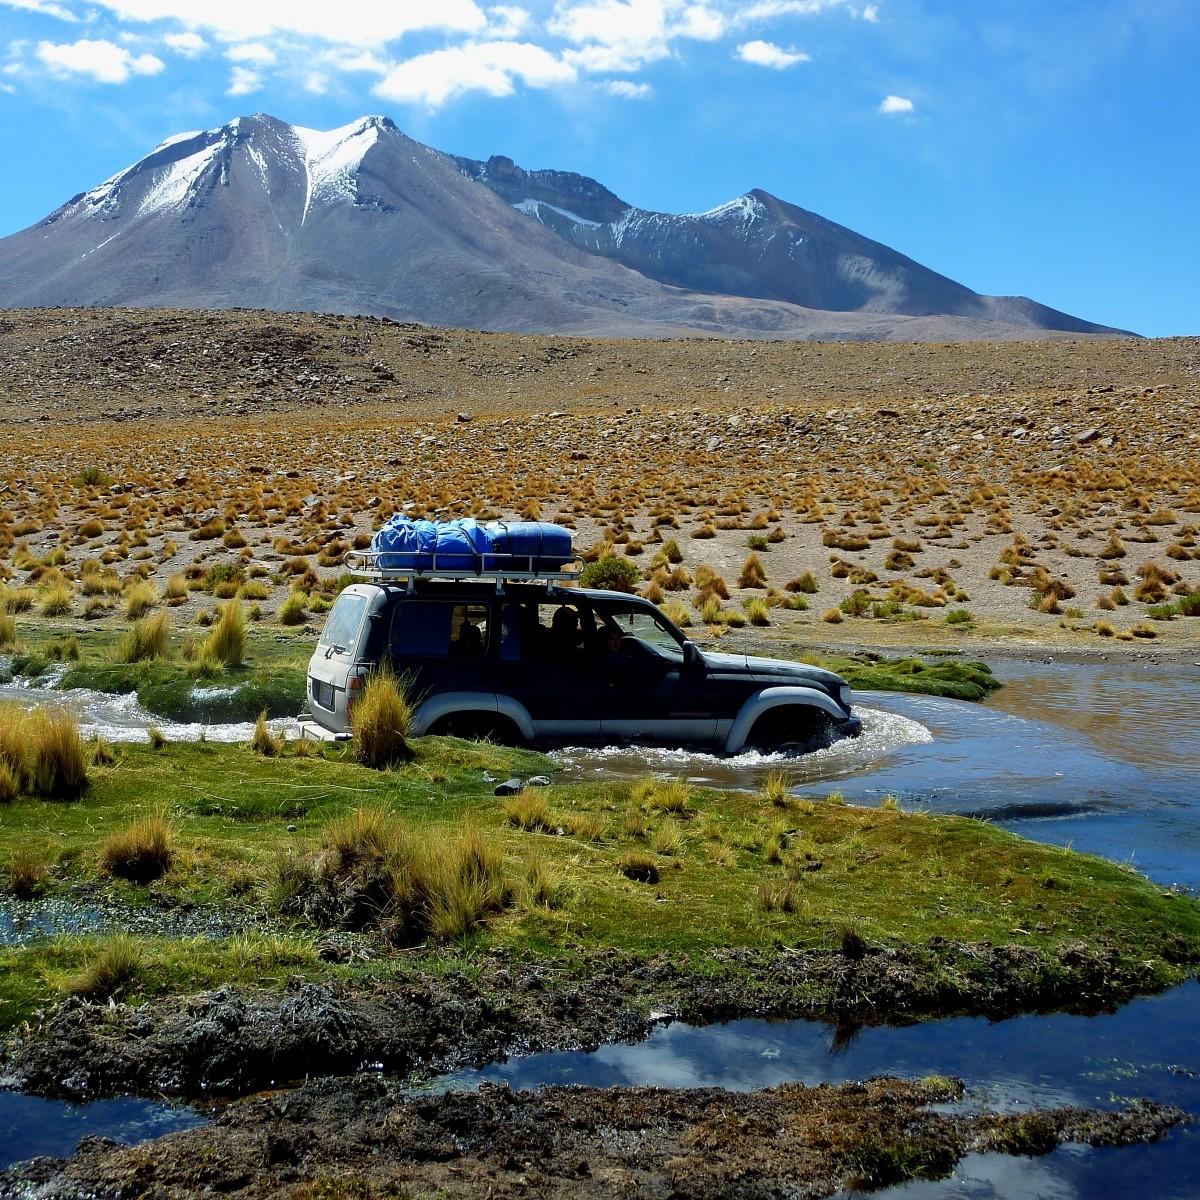 Zdjęcia: Salar de Uyuni, Salar de Uyuni, Salar de Uyuni, BOLIWIA